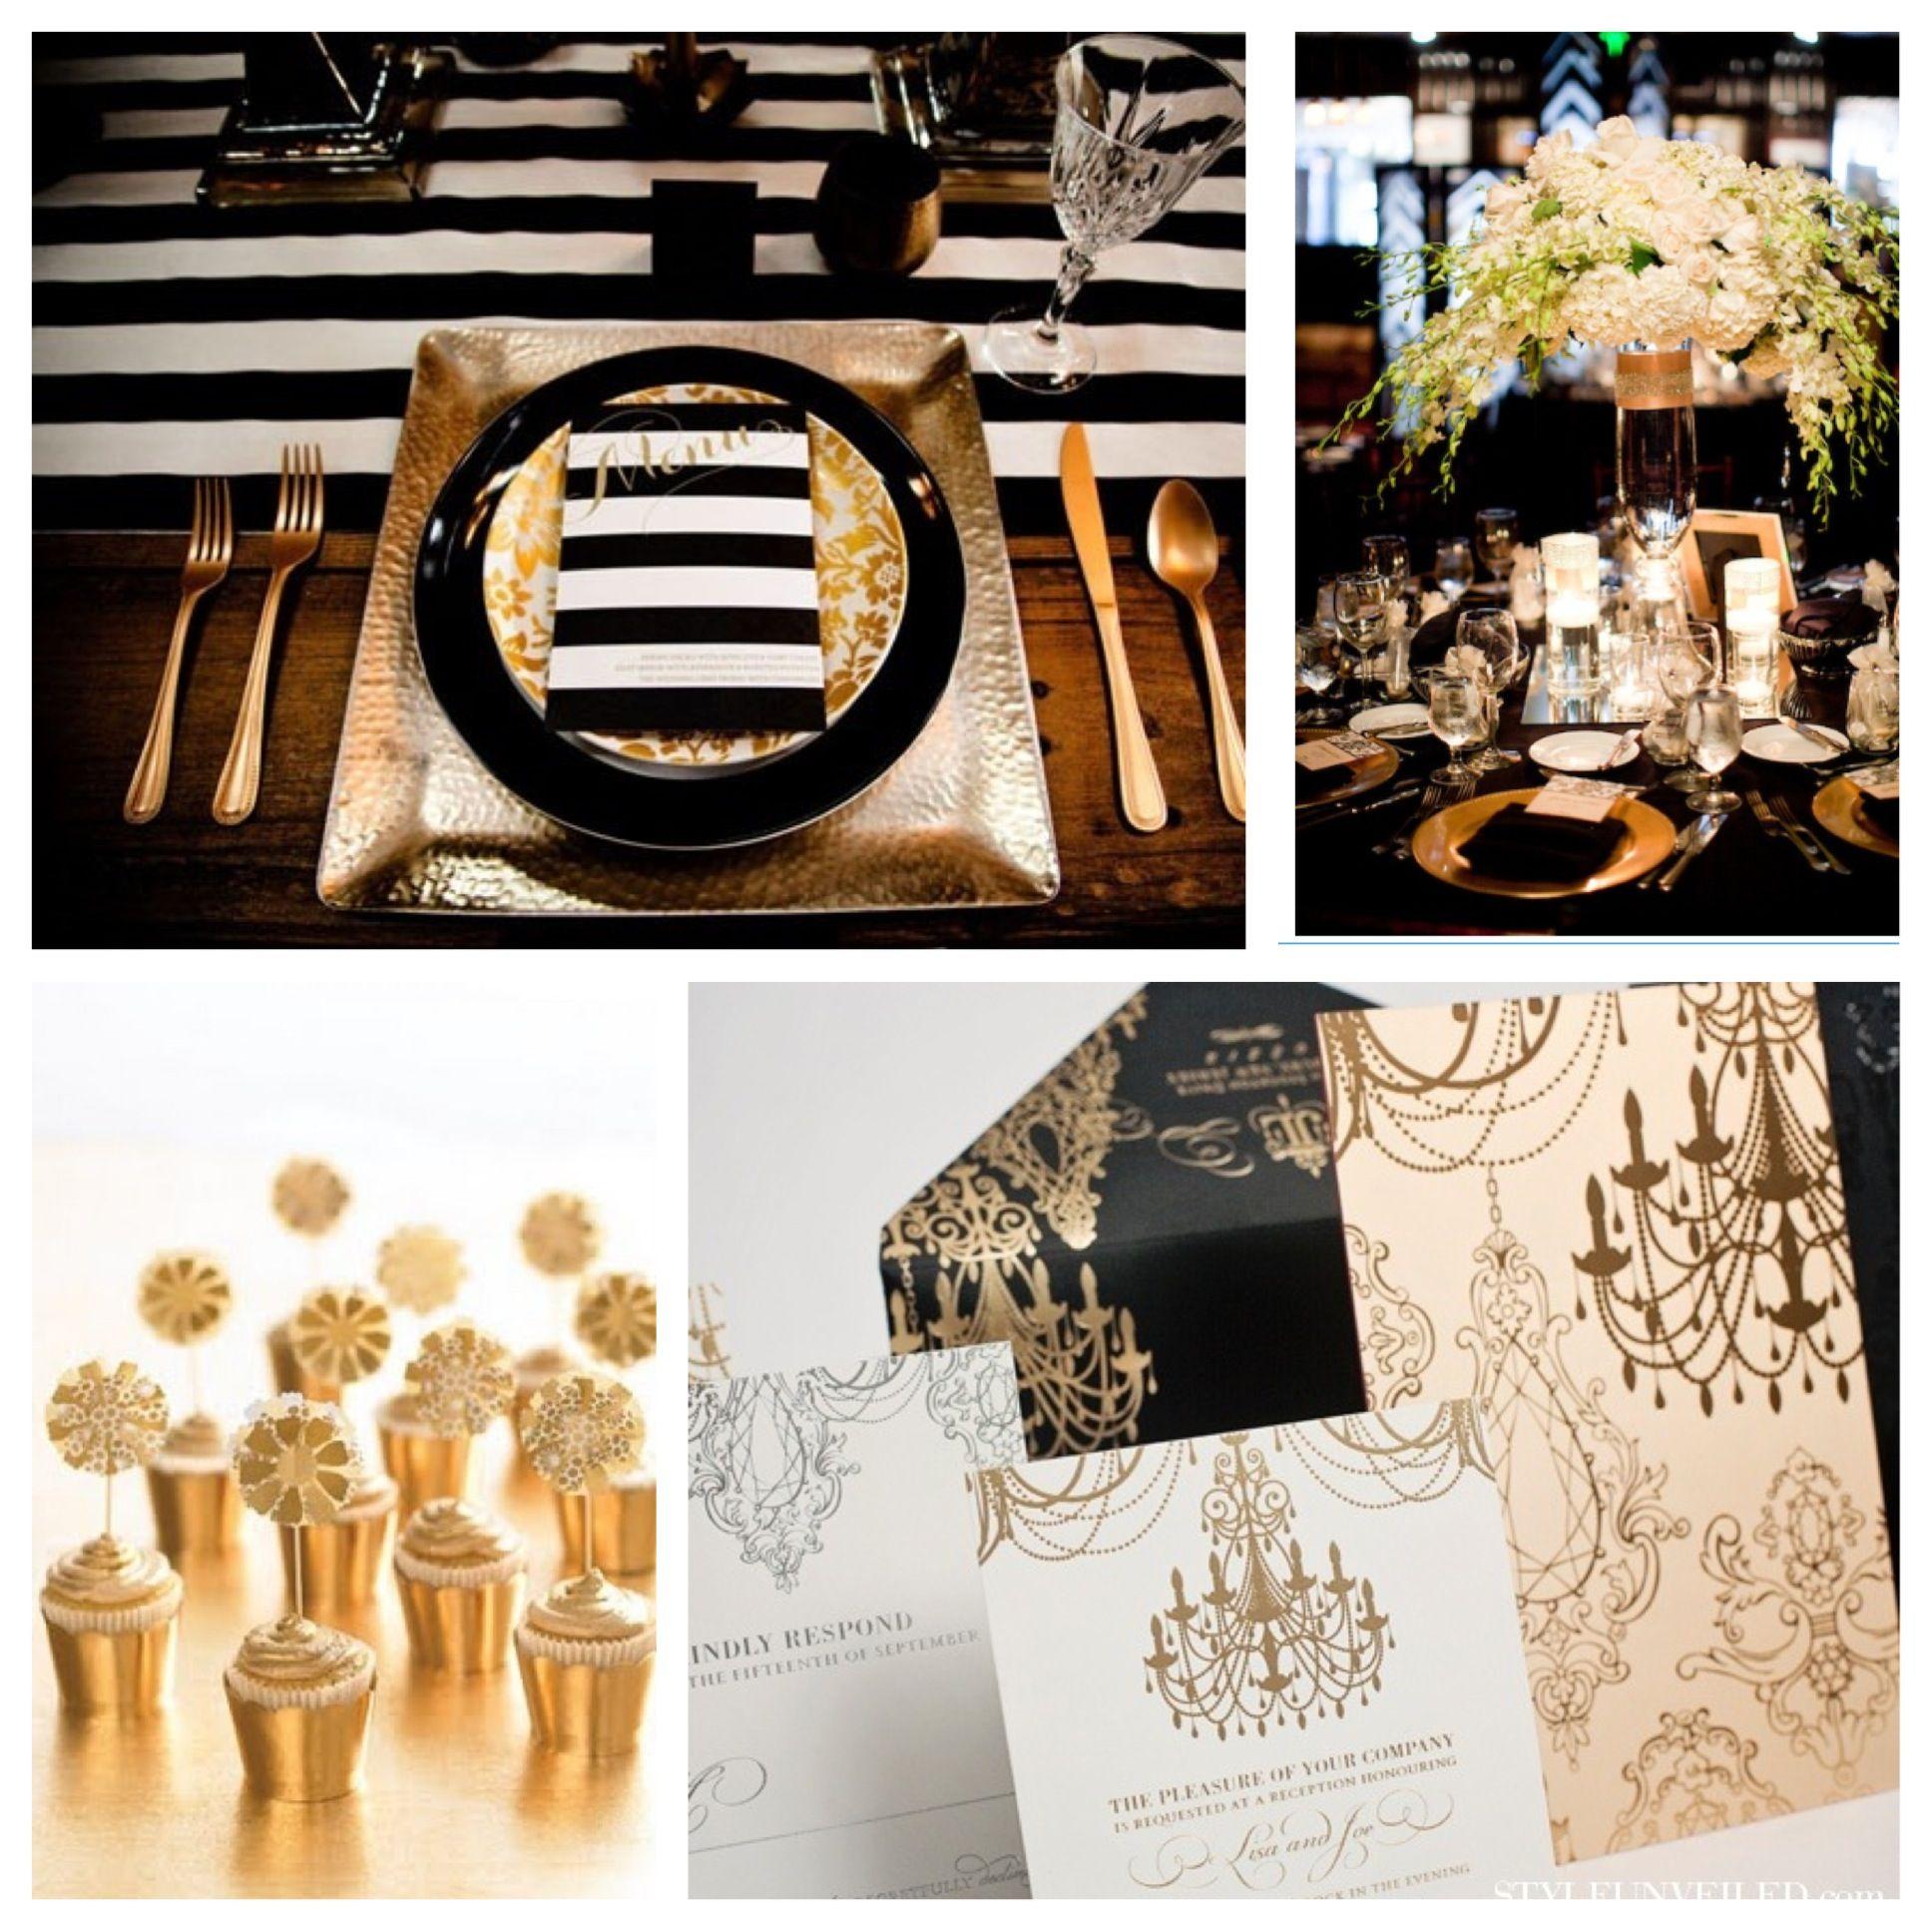 Black And Gold Wedding: Gatsby/Glam Wedding Theme